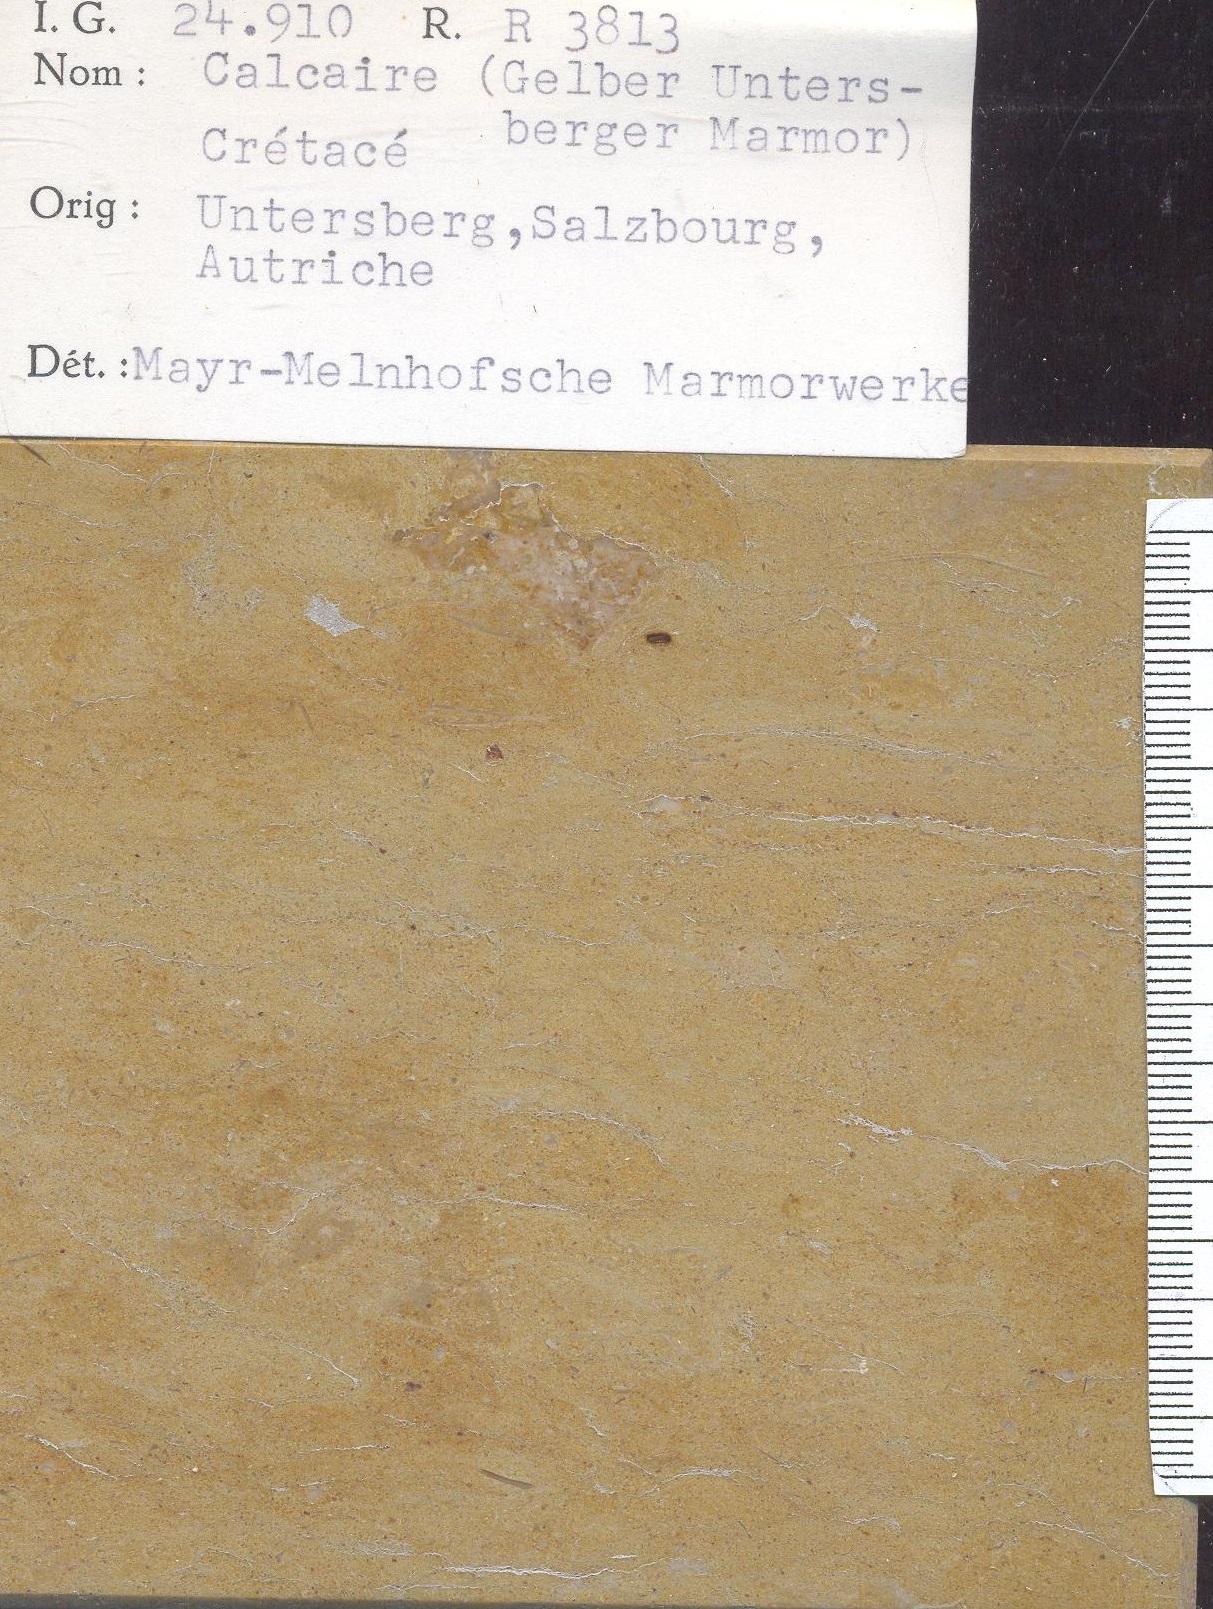 Gelber untersberger marmor RR3813